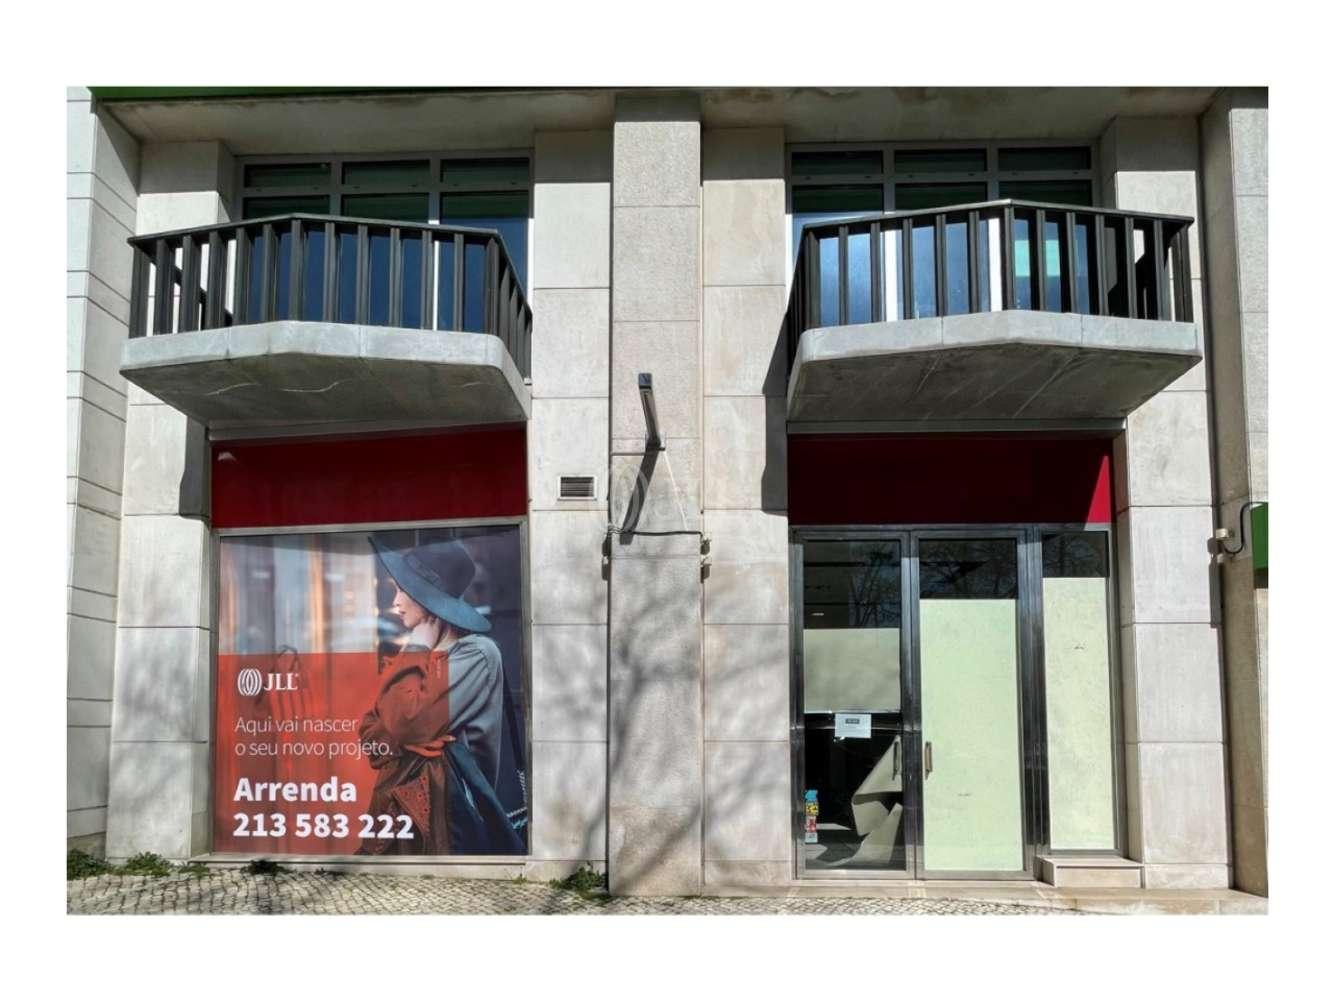 Loja Lisboa,  - Loja localizada na Avenida da Liberdade 242